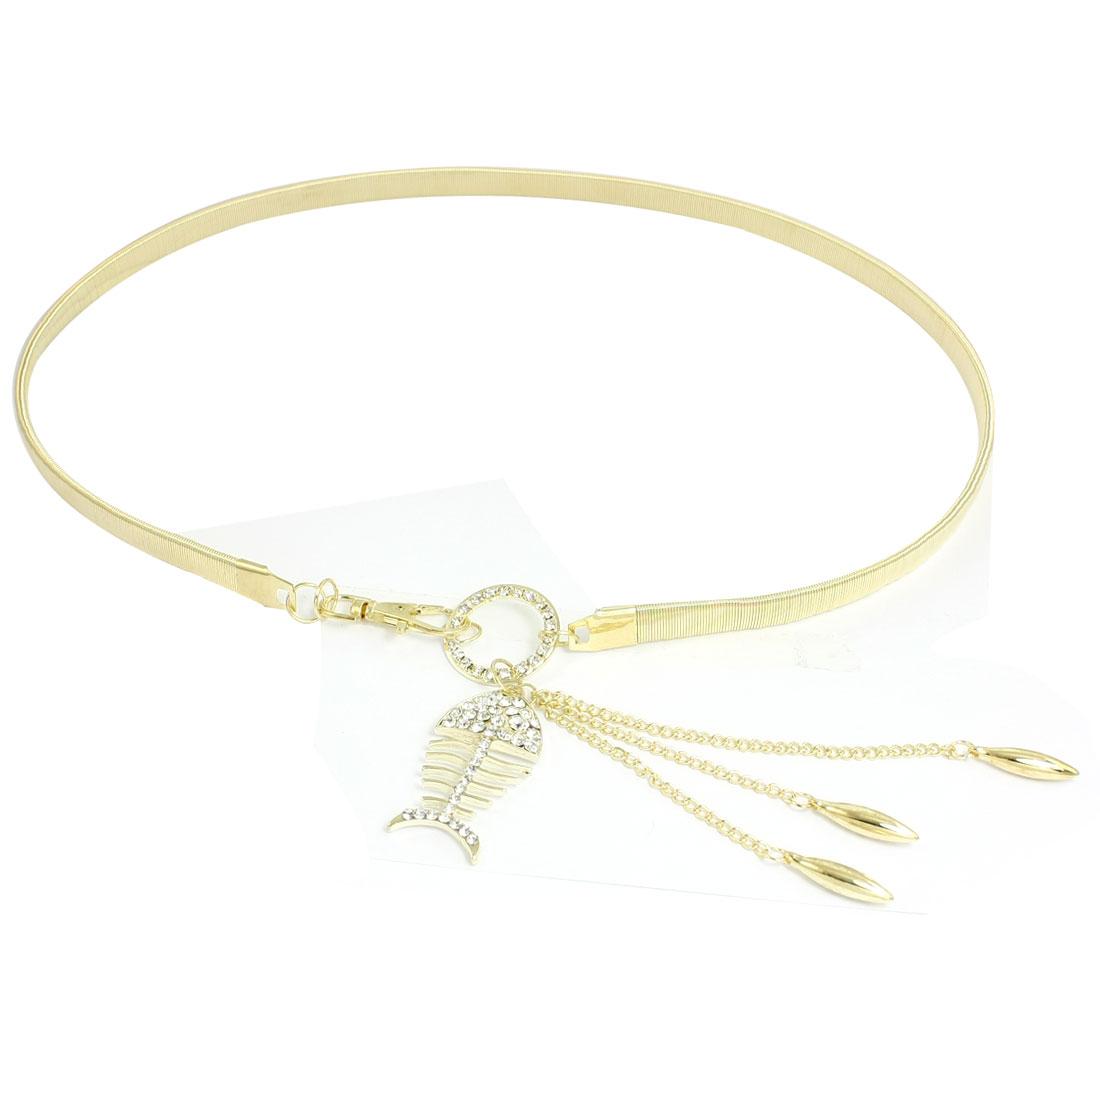 Hollow Fish Rhinestone Bead Decor Lobster Clasp Elastic Waist Belt Chain Gold Tone